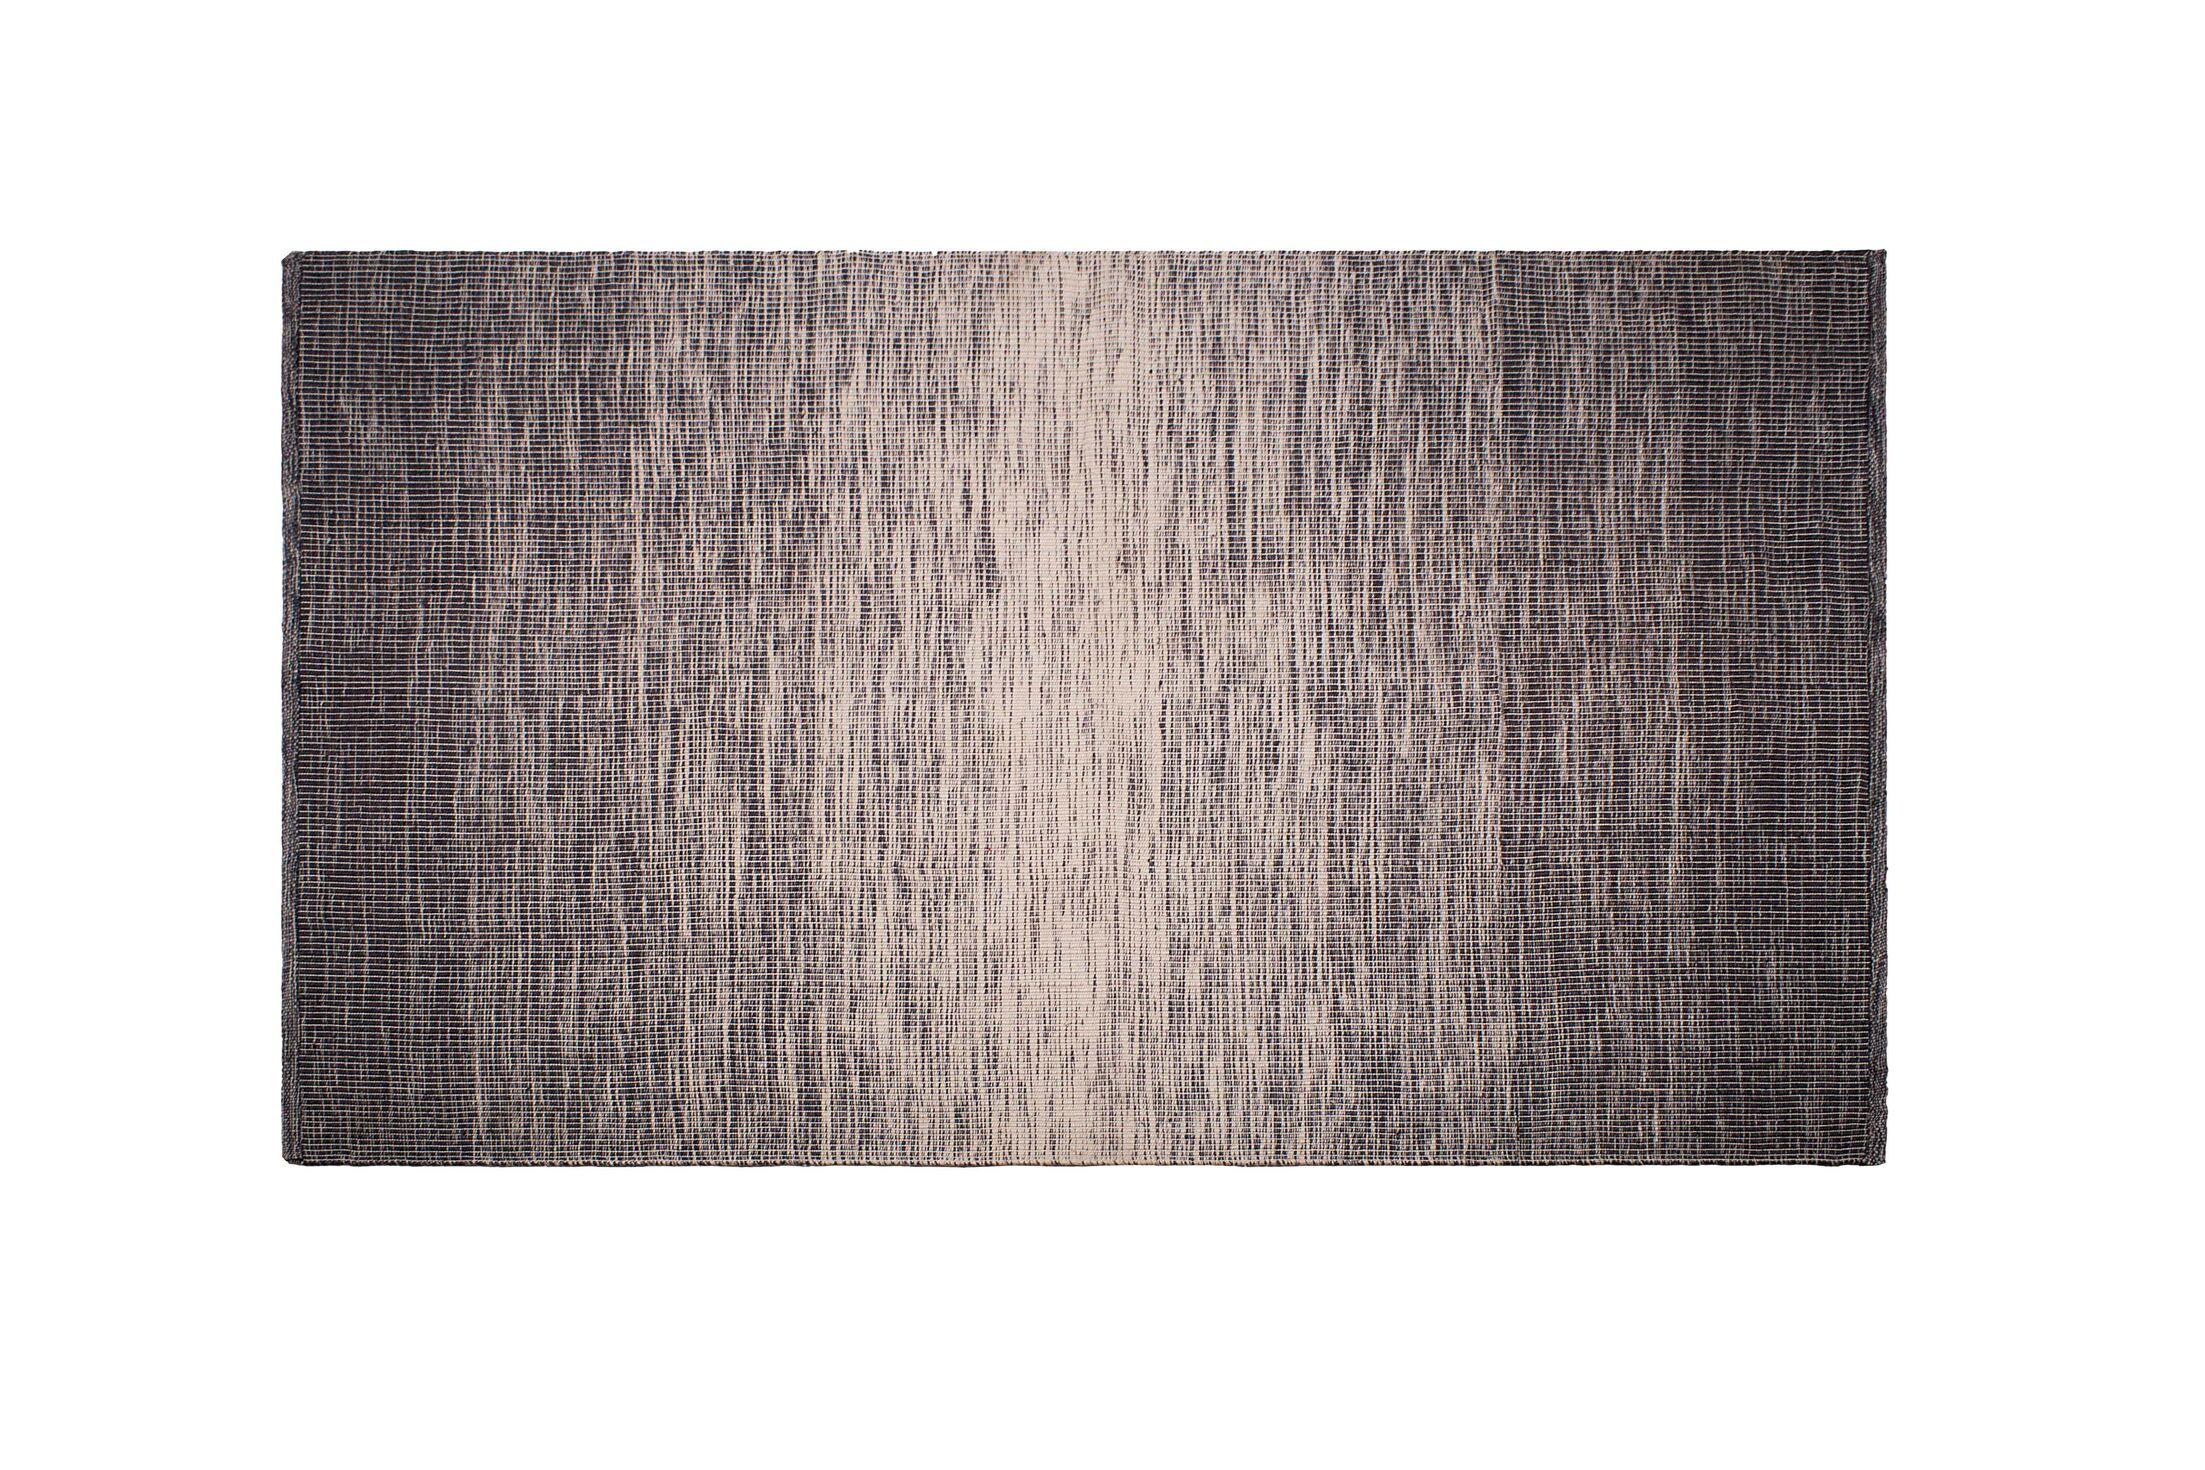 Mcgrew Hand-Woven Gray Indoor/Outdoor Area Rug Rug Size: Rectangle 6' x 9'